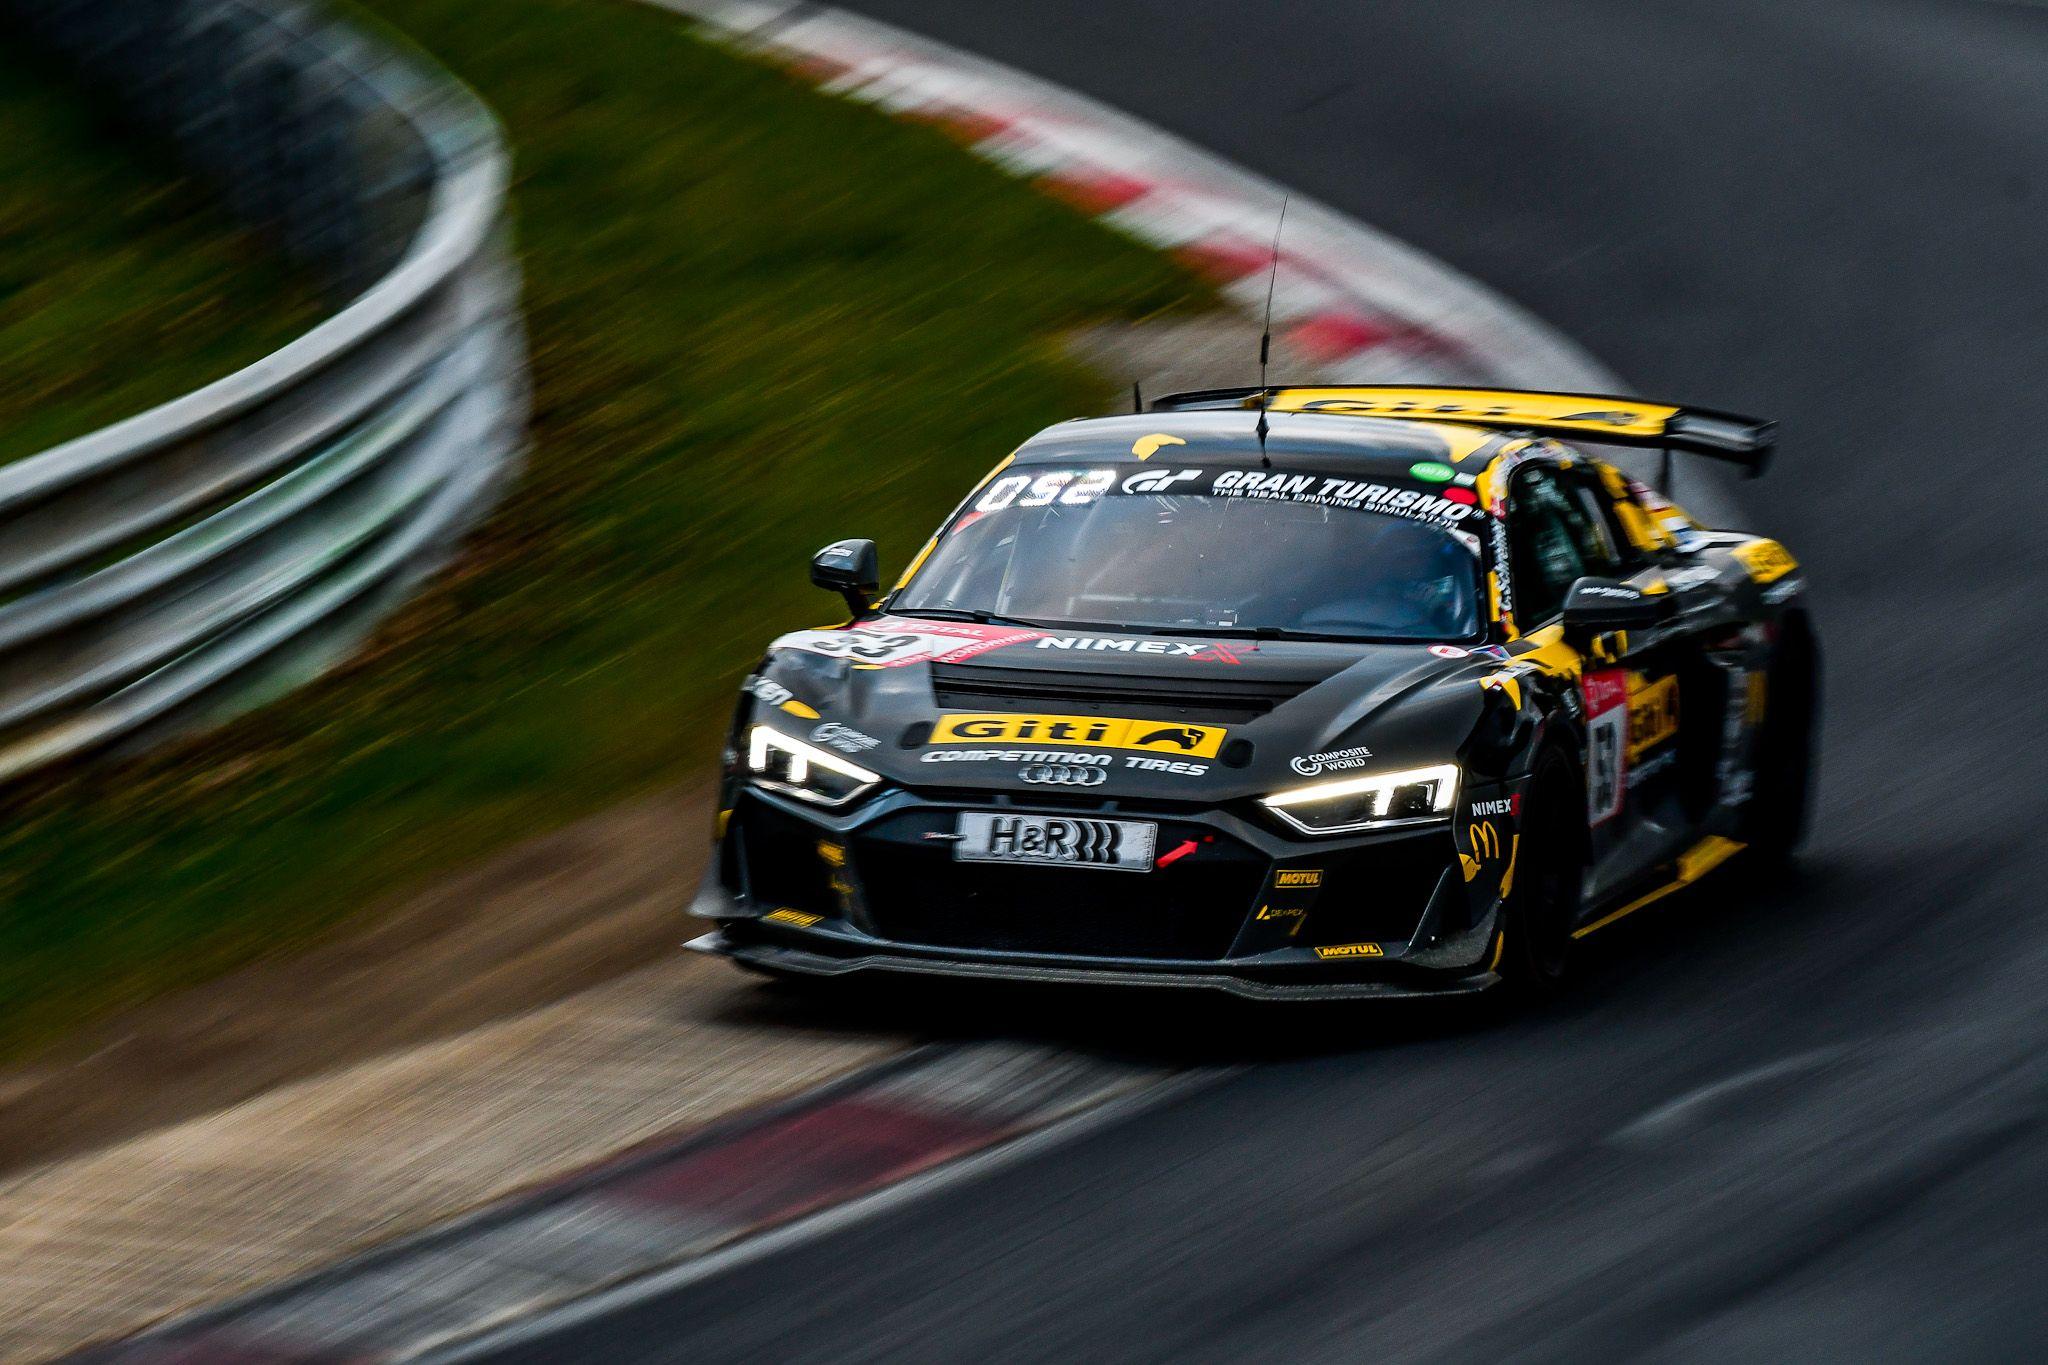 Foto de Giti Tire Motorsports by WS Racing's Audi R8 LMS GT4